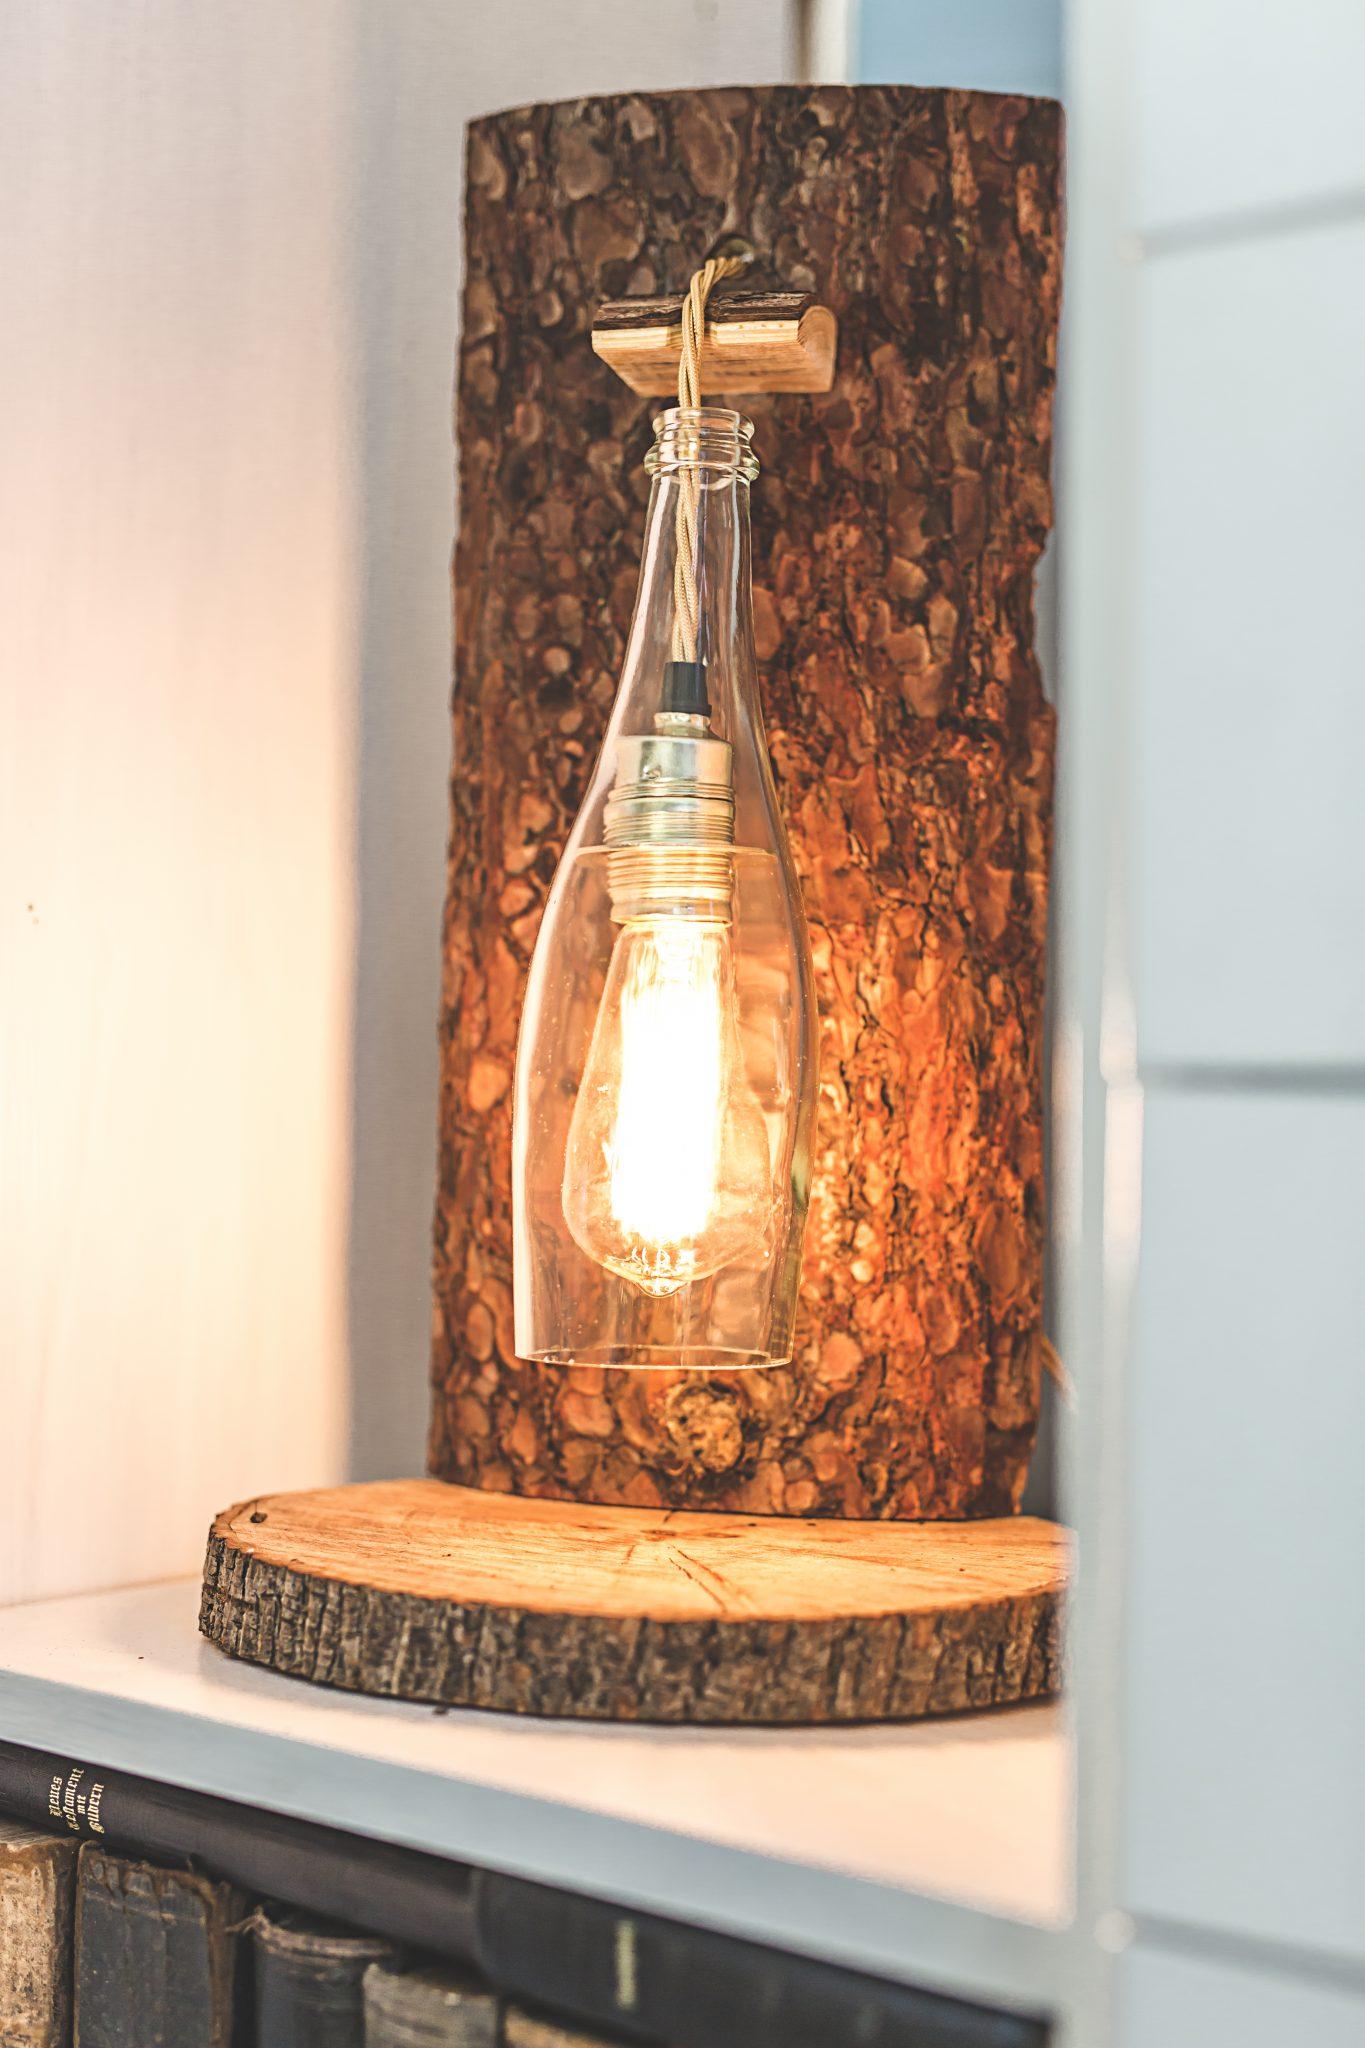 Rustikale Stehlampe mit Pendelleuchte